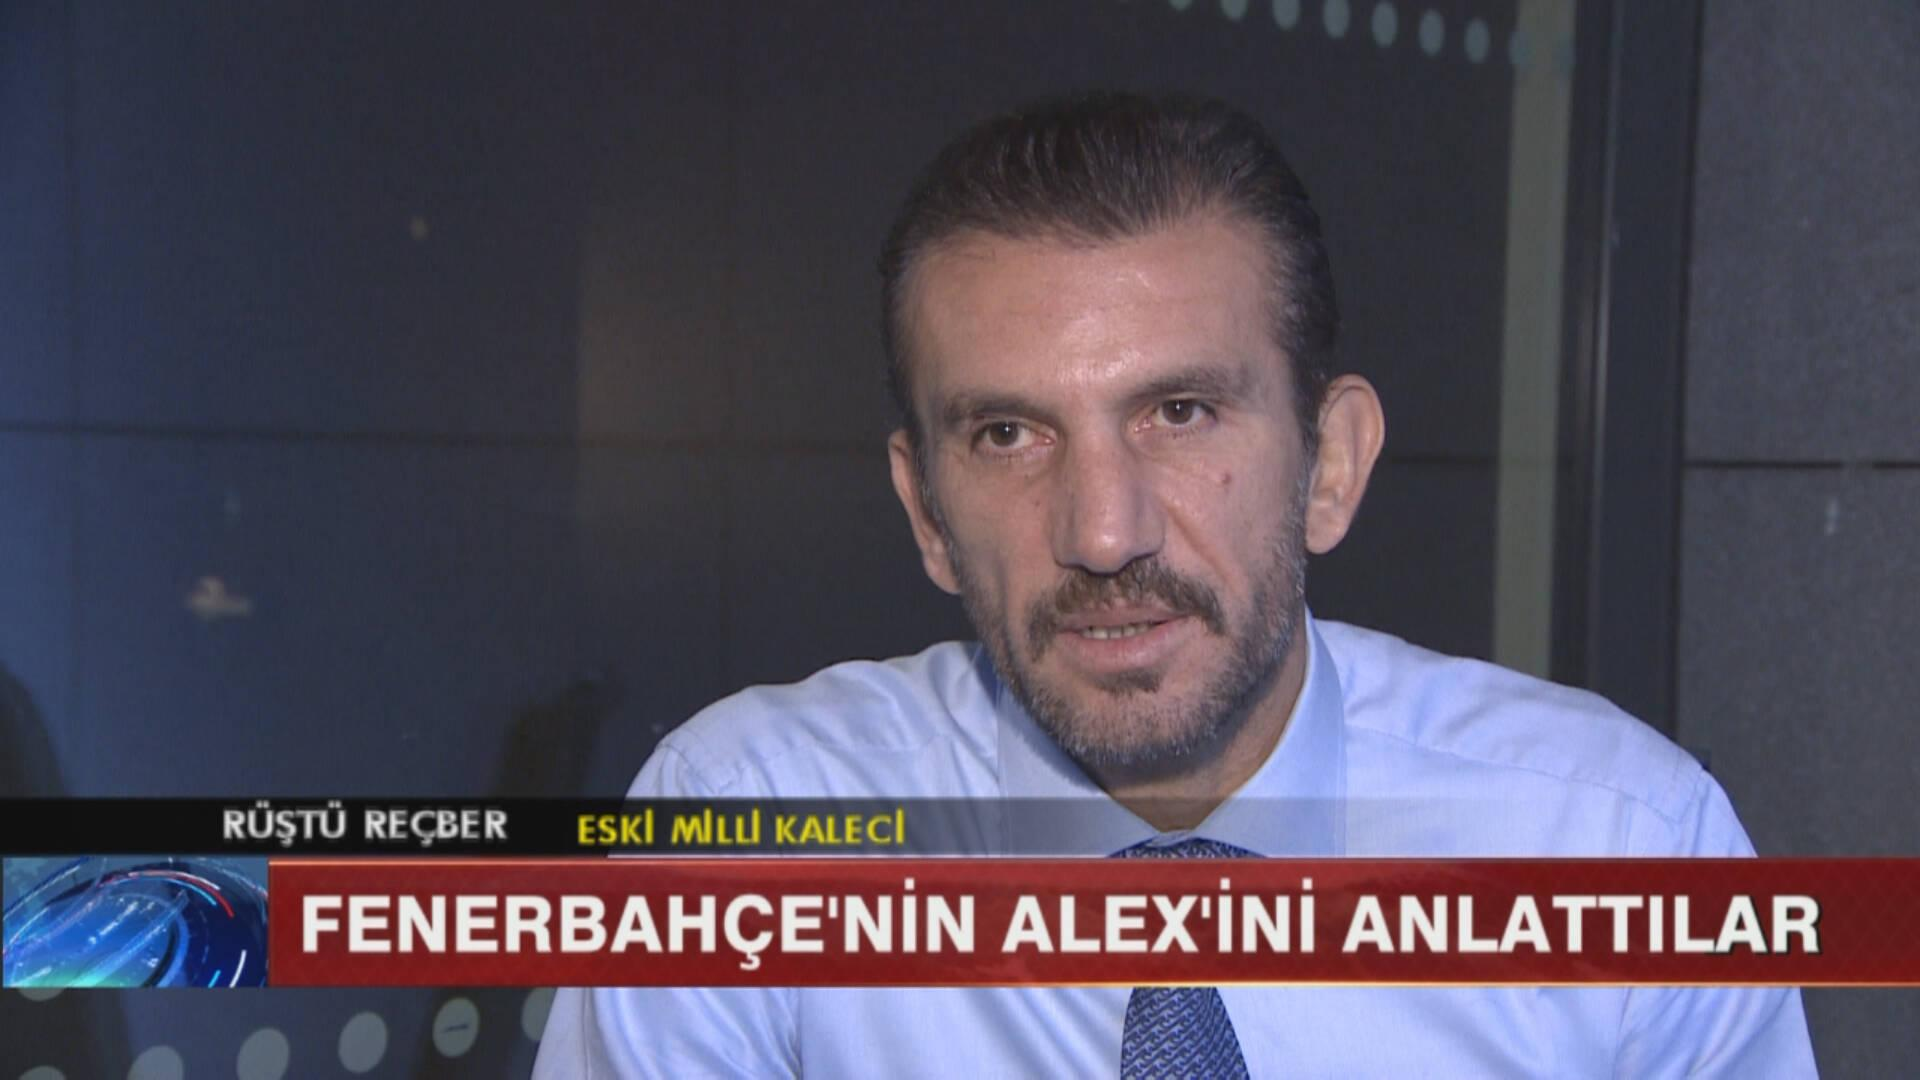 İşte Fenerbahçe'nin Alex'i!